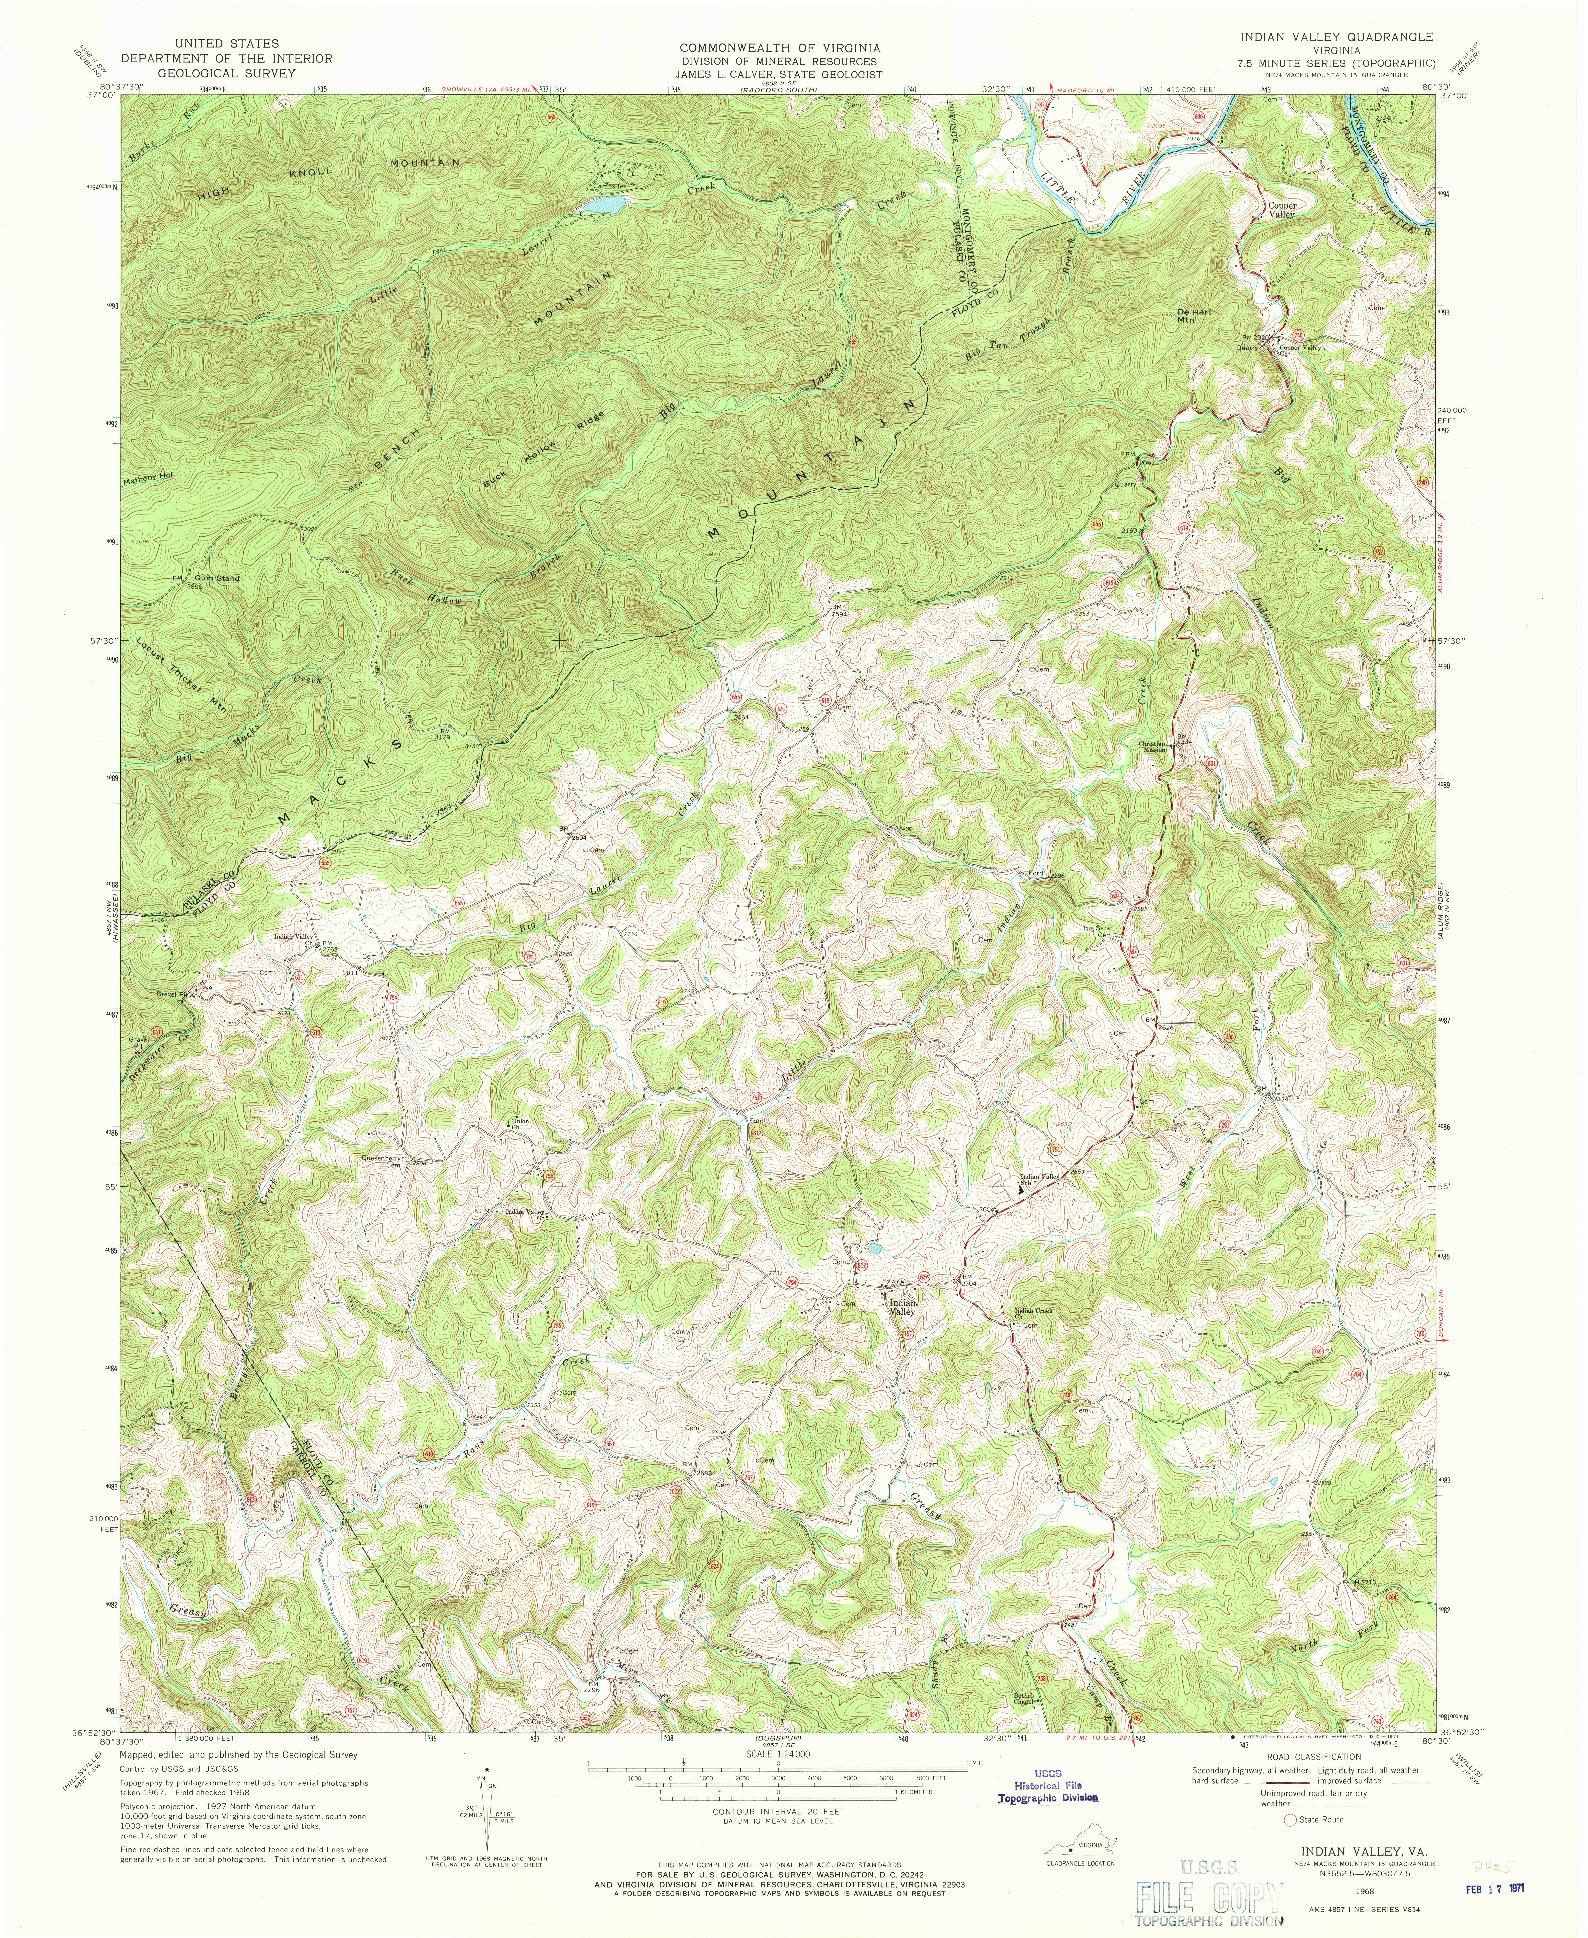 USGS 1:24000-SCALE QUADRANGLE FOR INDIAN VALLEY, VA 1968